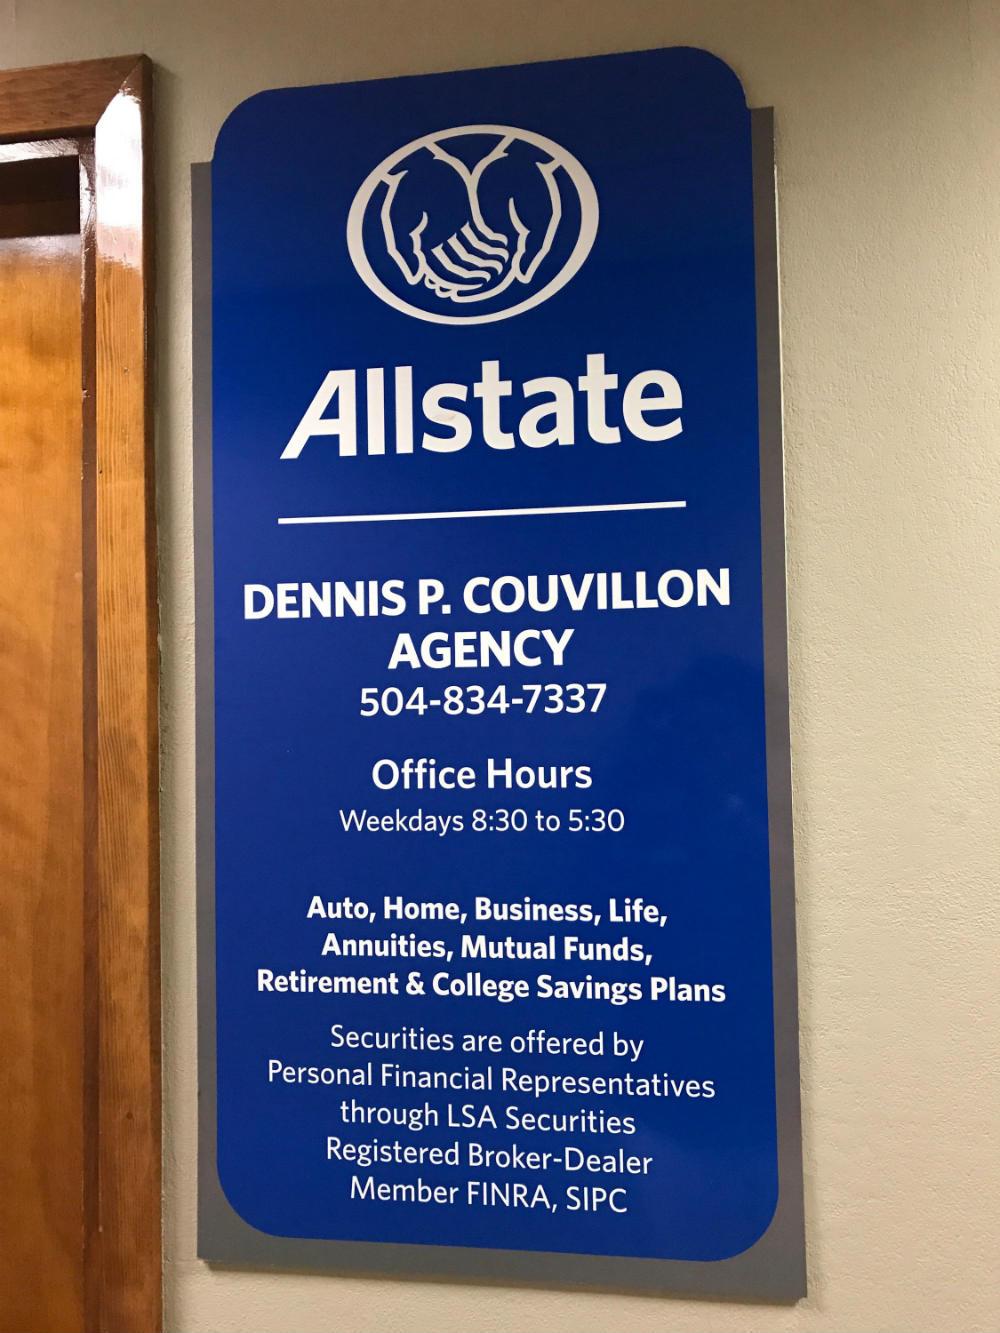 Dennis P. Couvillon: Allstate Insurance image 1